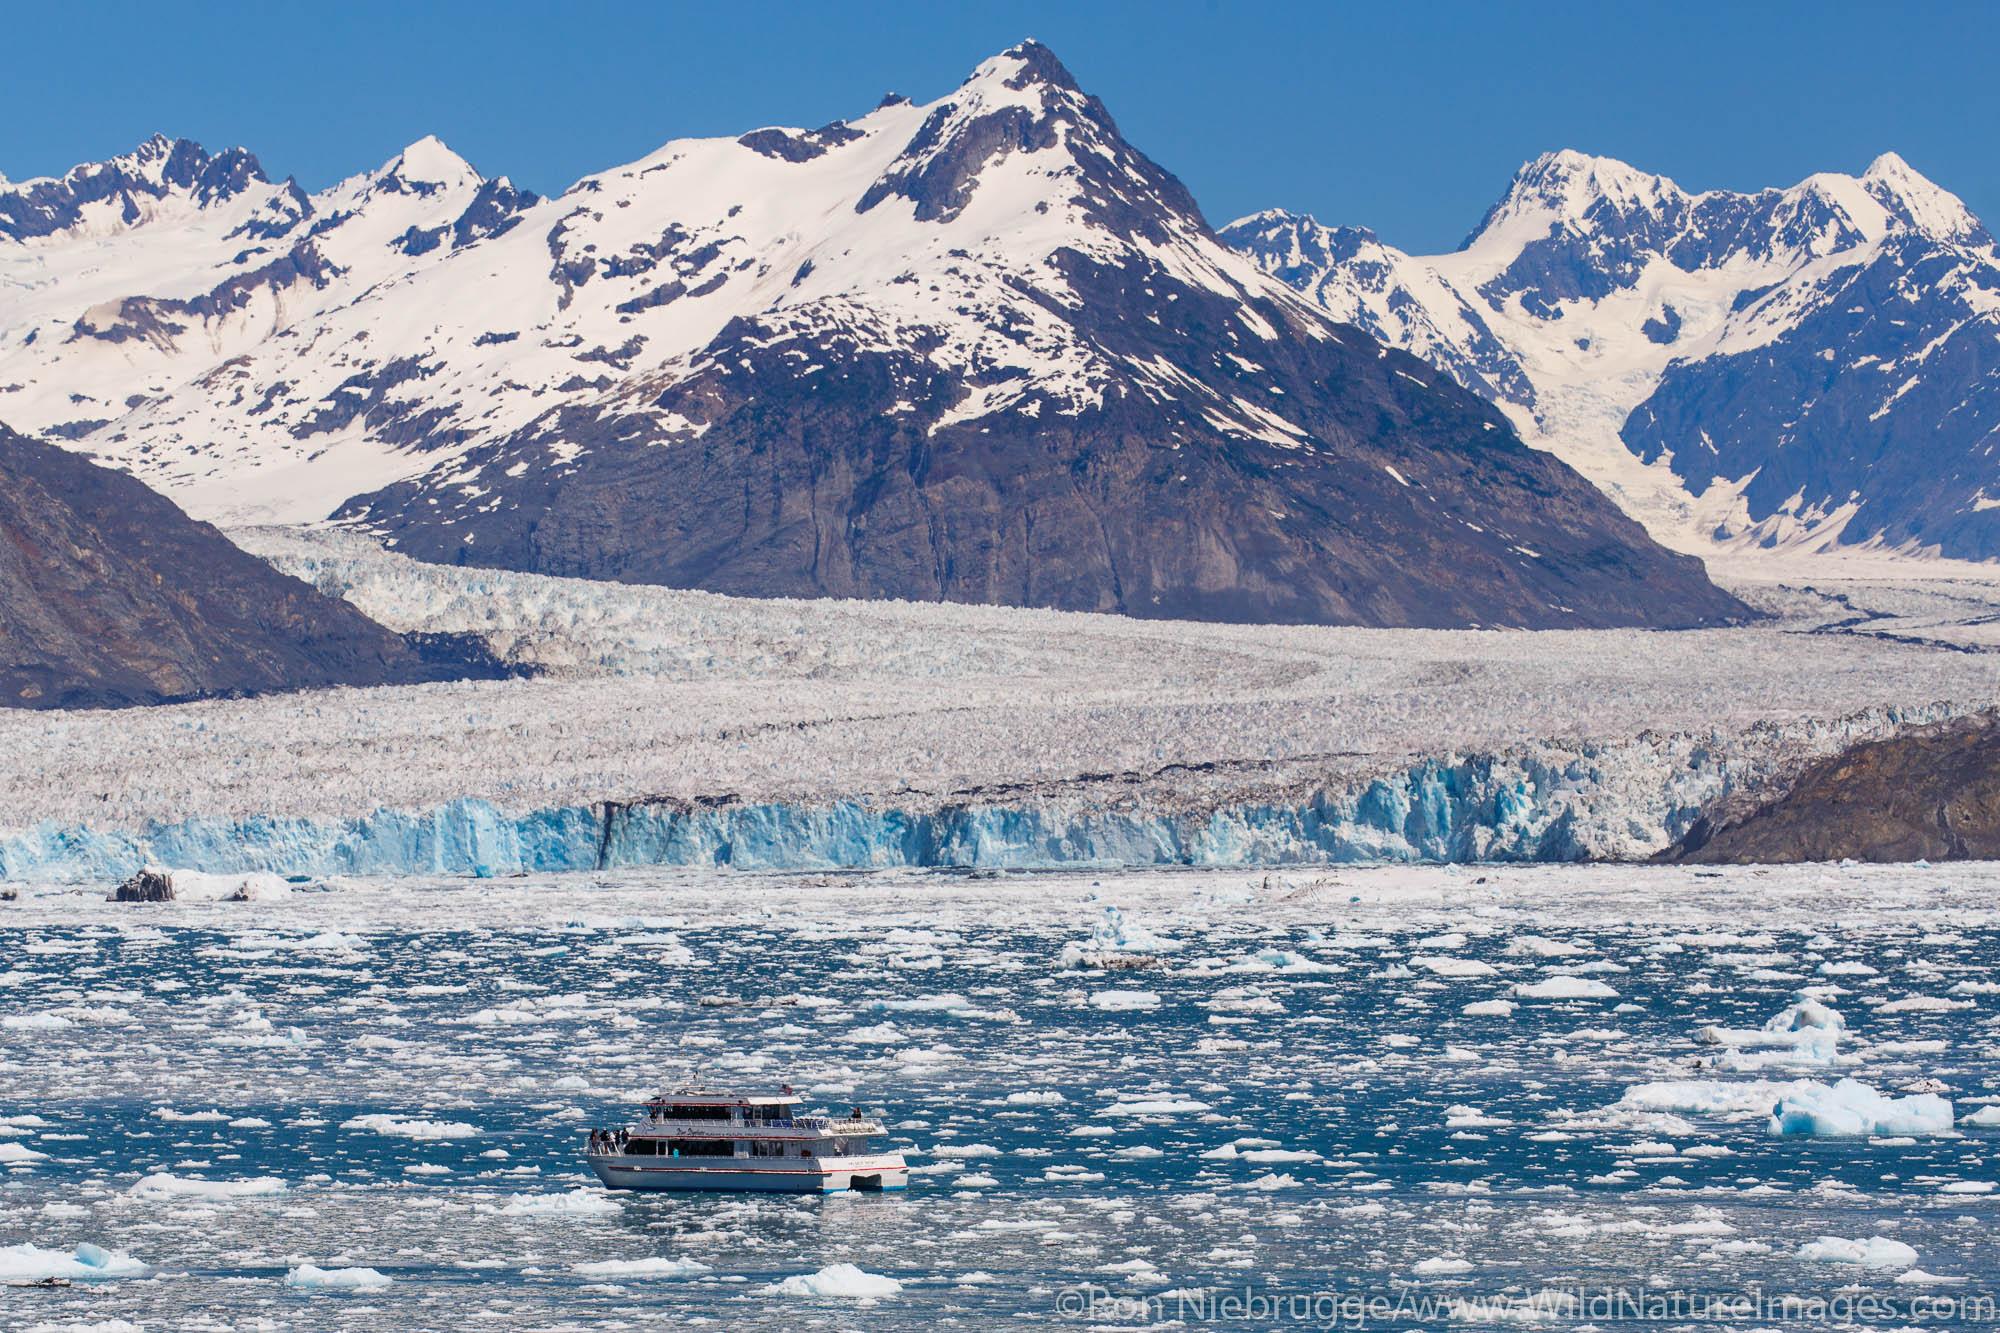 Tour boat at Columbia Glacier, Prince William Sound, Alaska.